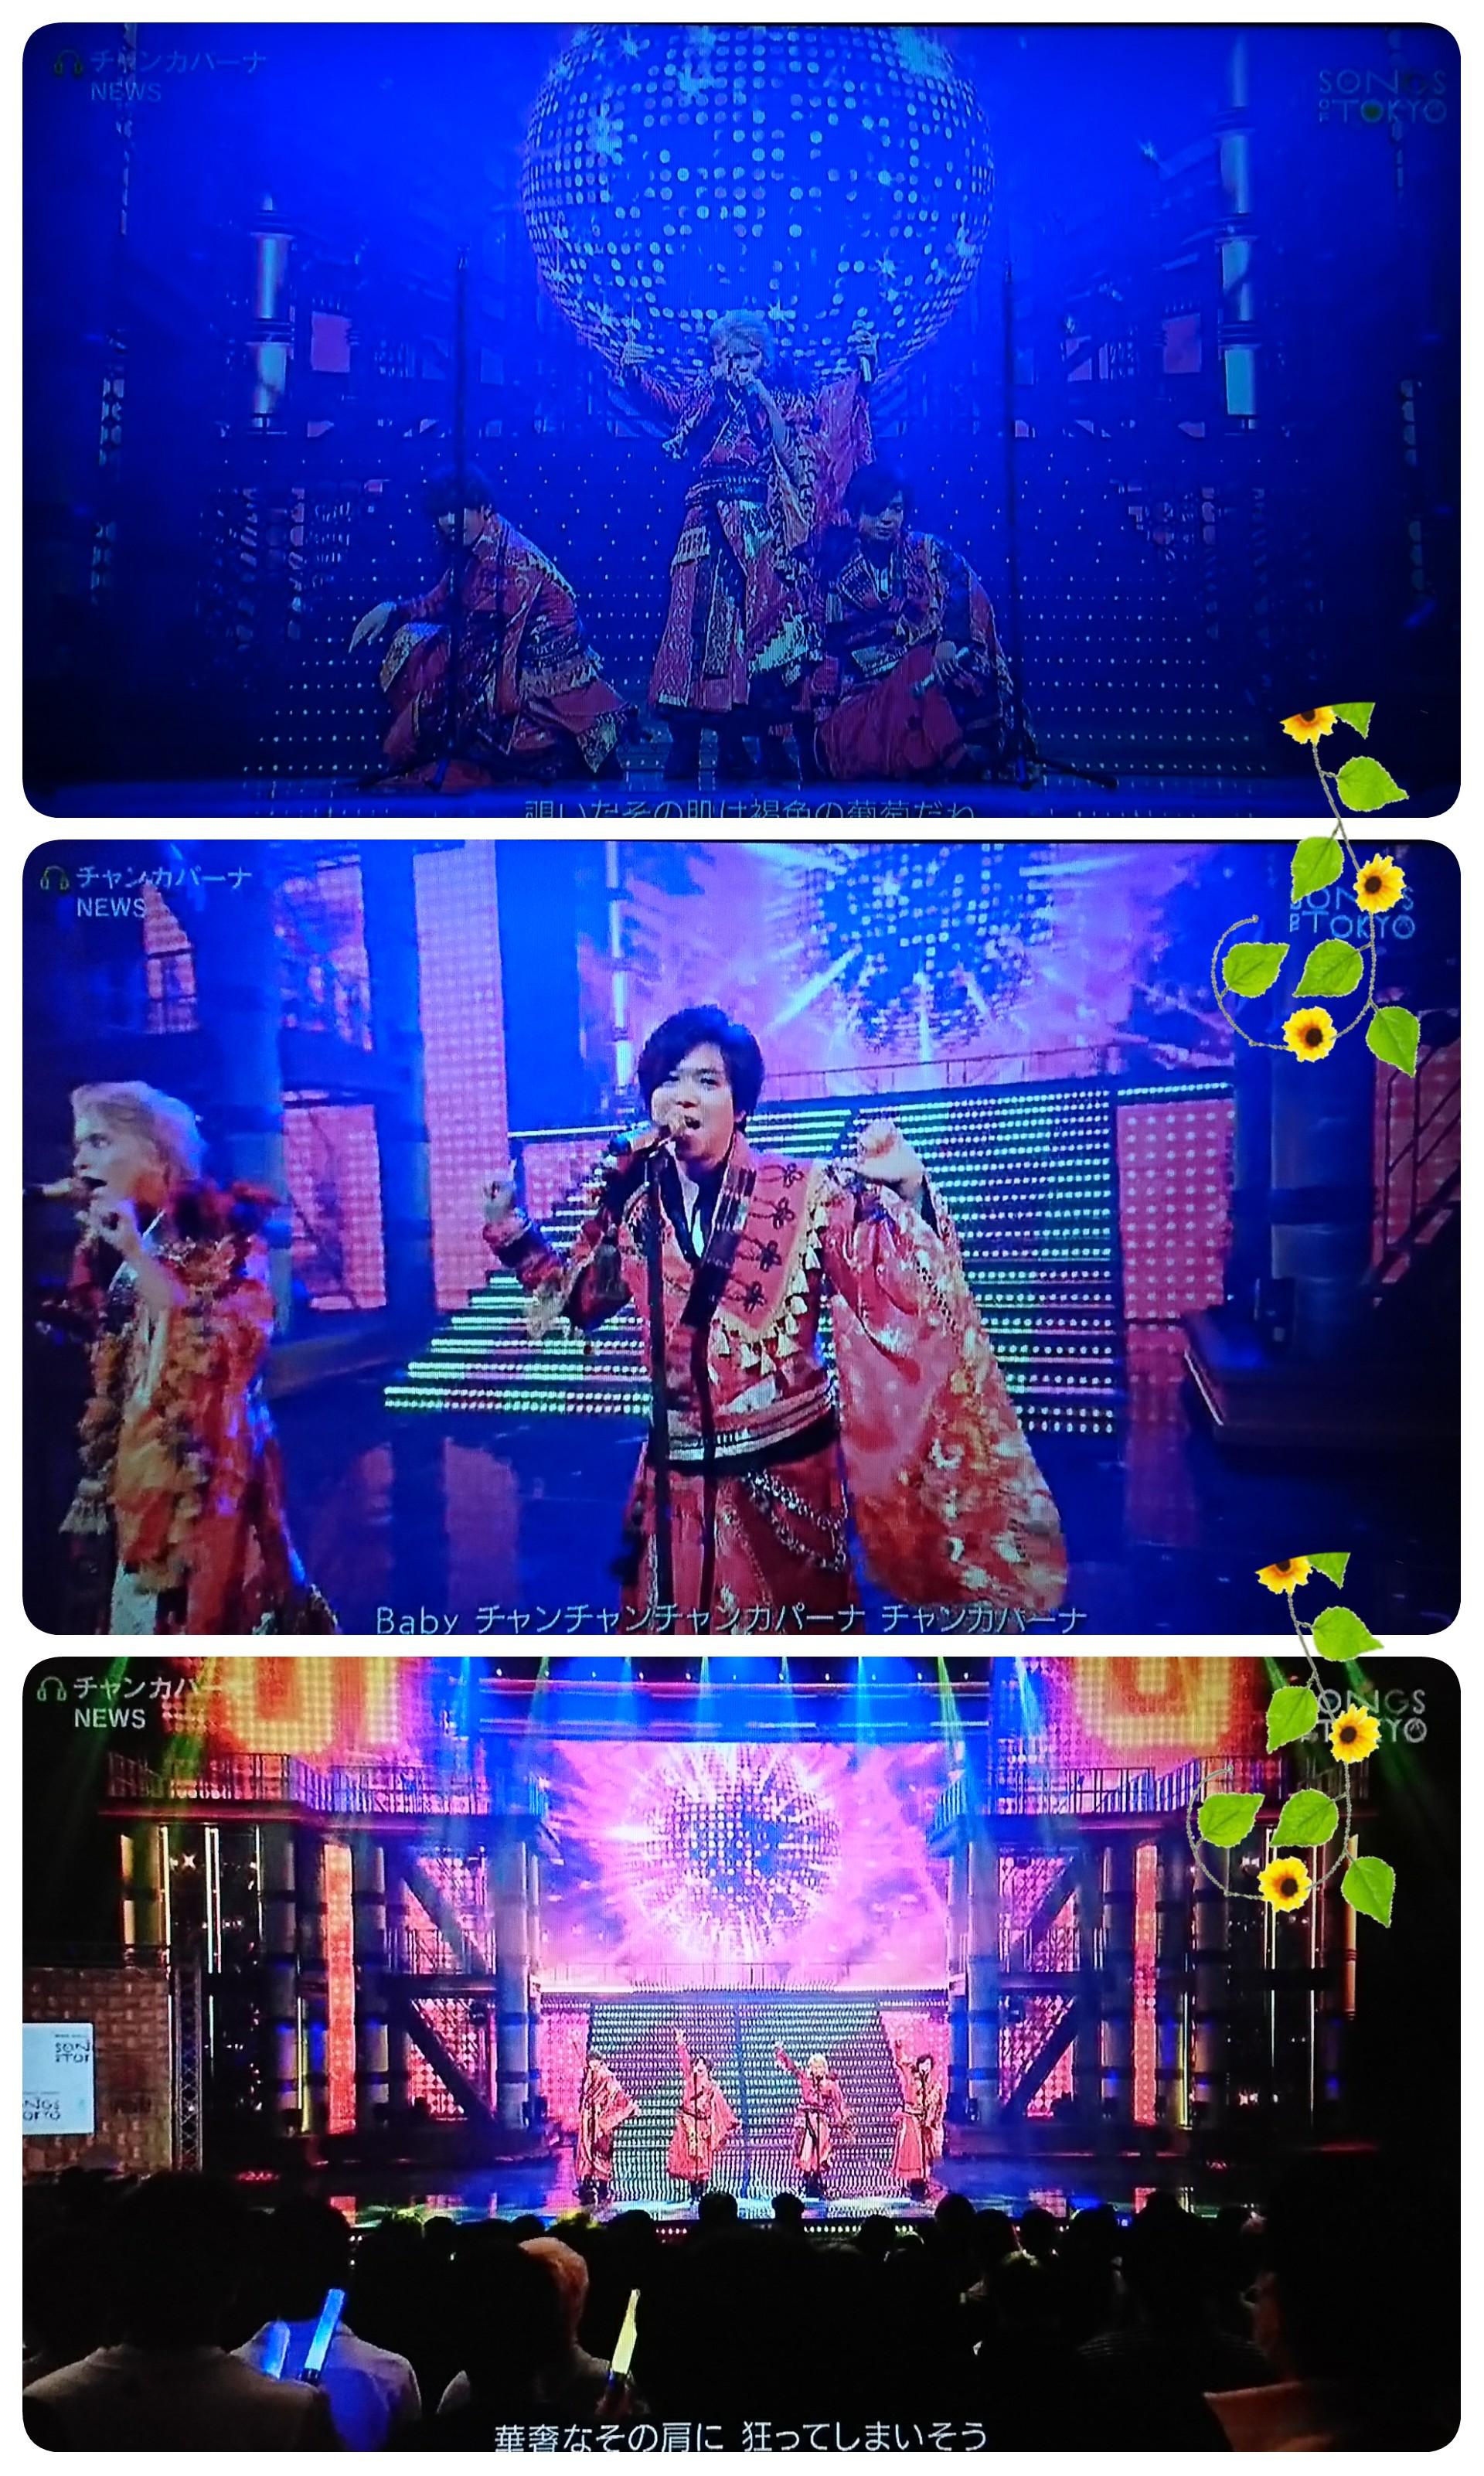 f:id:sunflower-shigeaki:20180109223948j:image